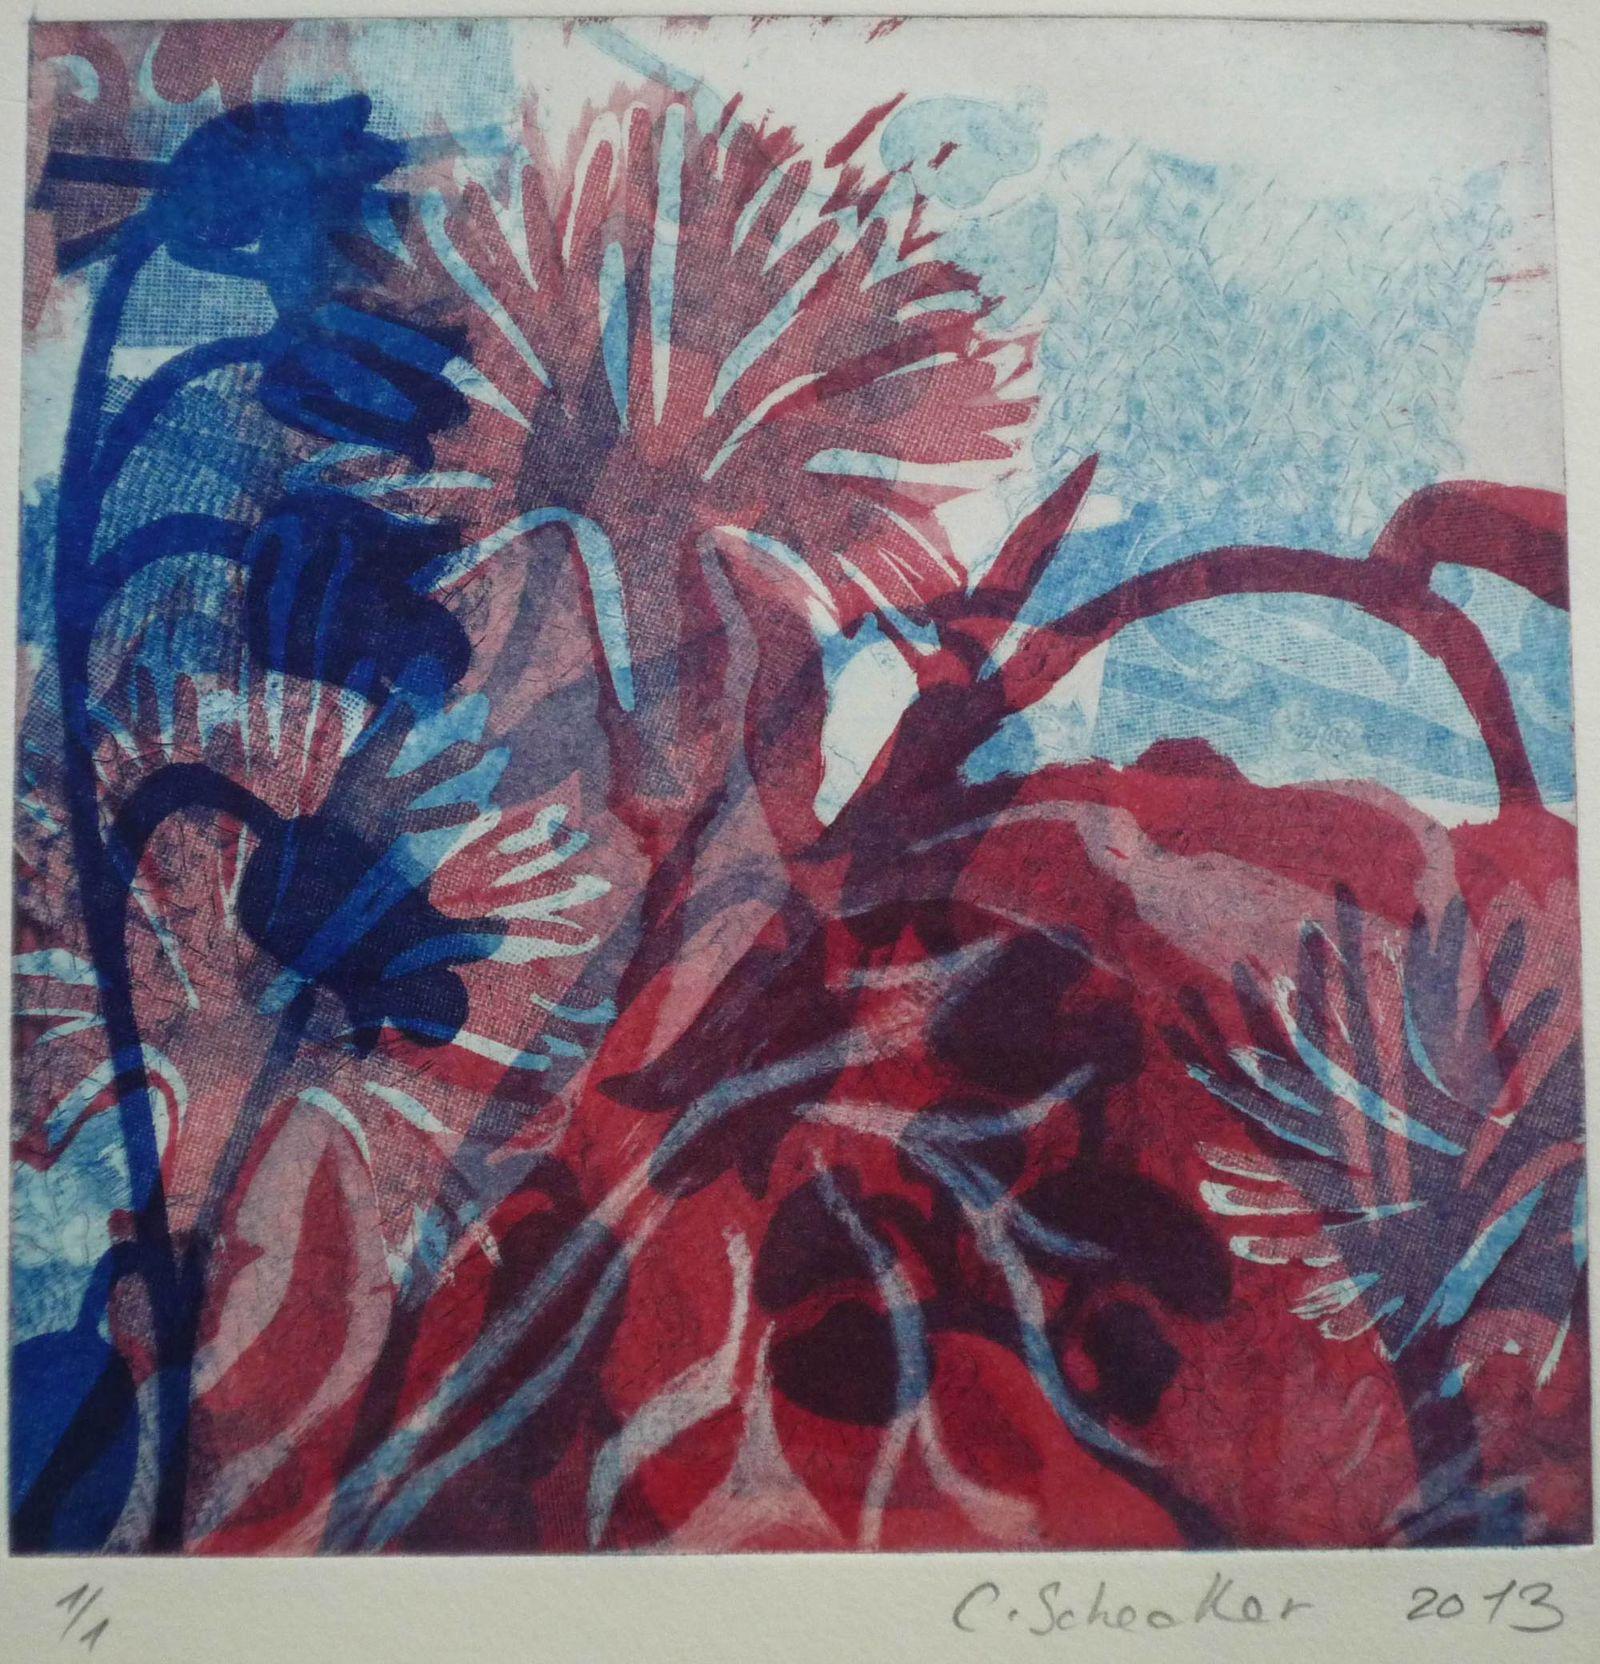 Mit Glockenblume, 2-farbige Radierung/Aquatinta, 20x20cm